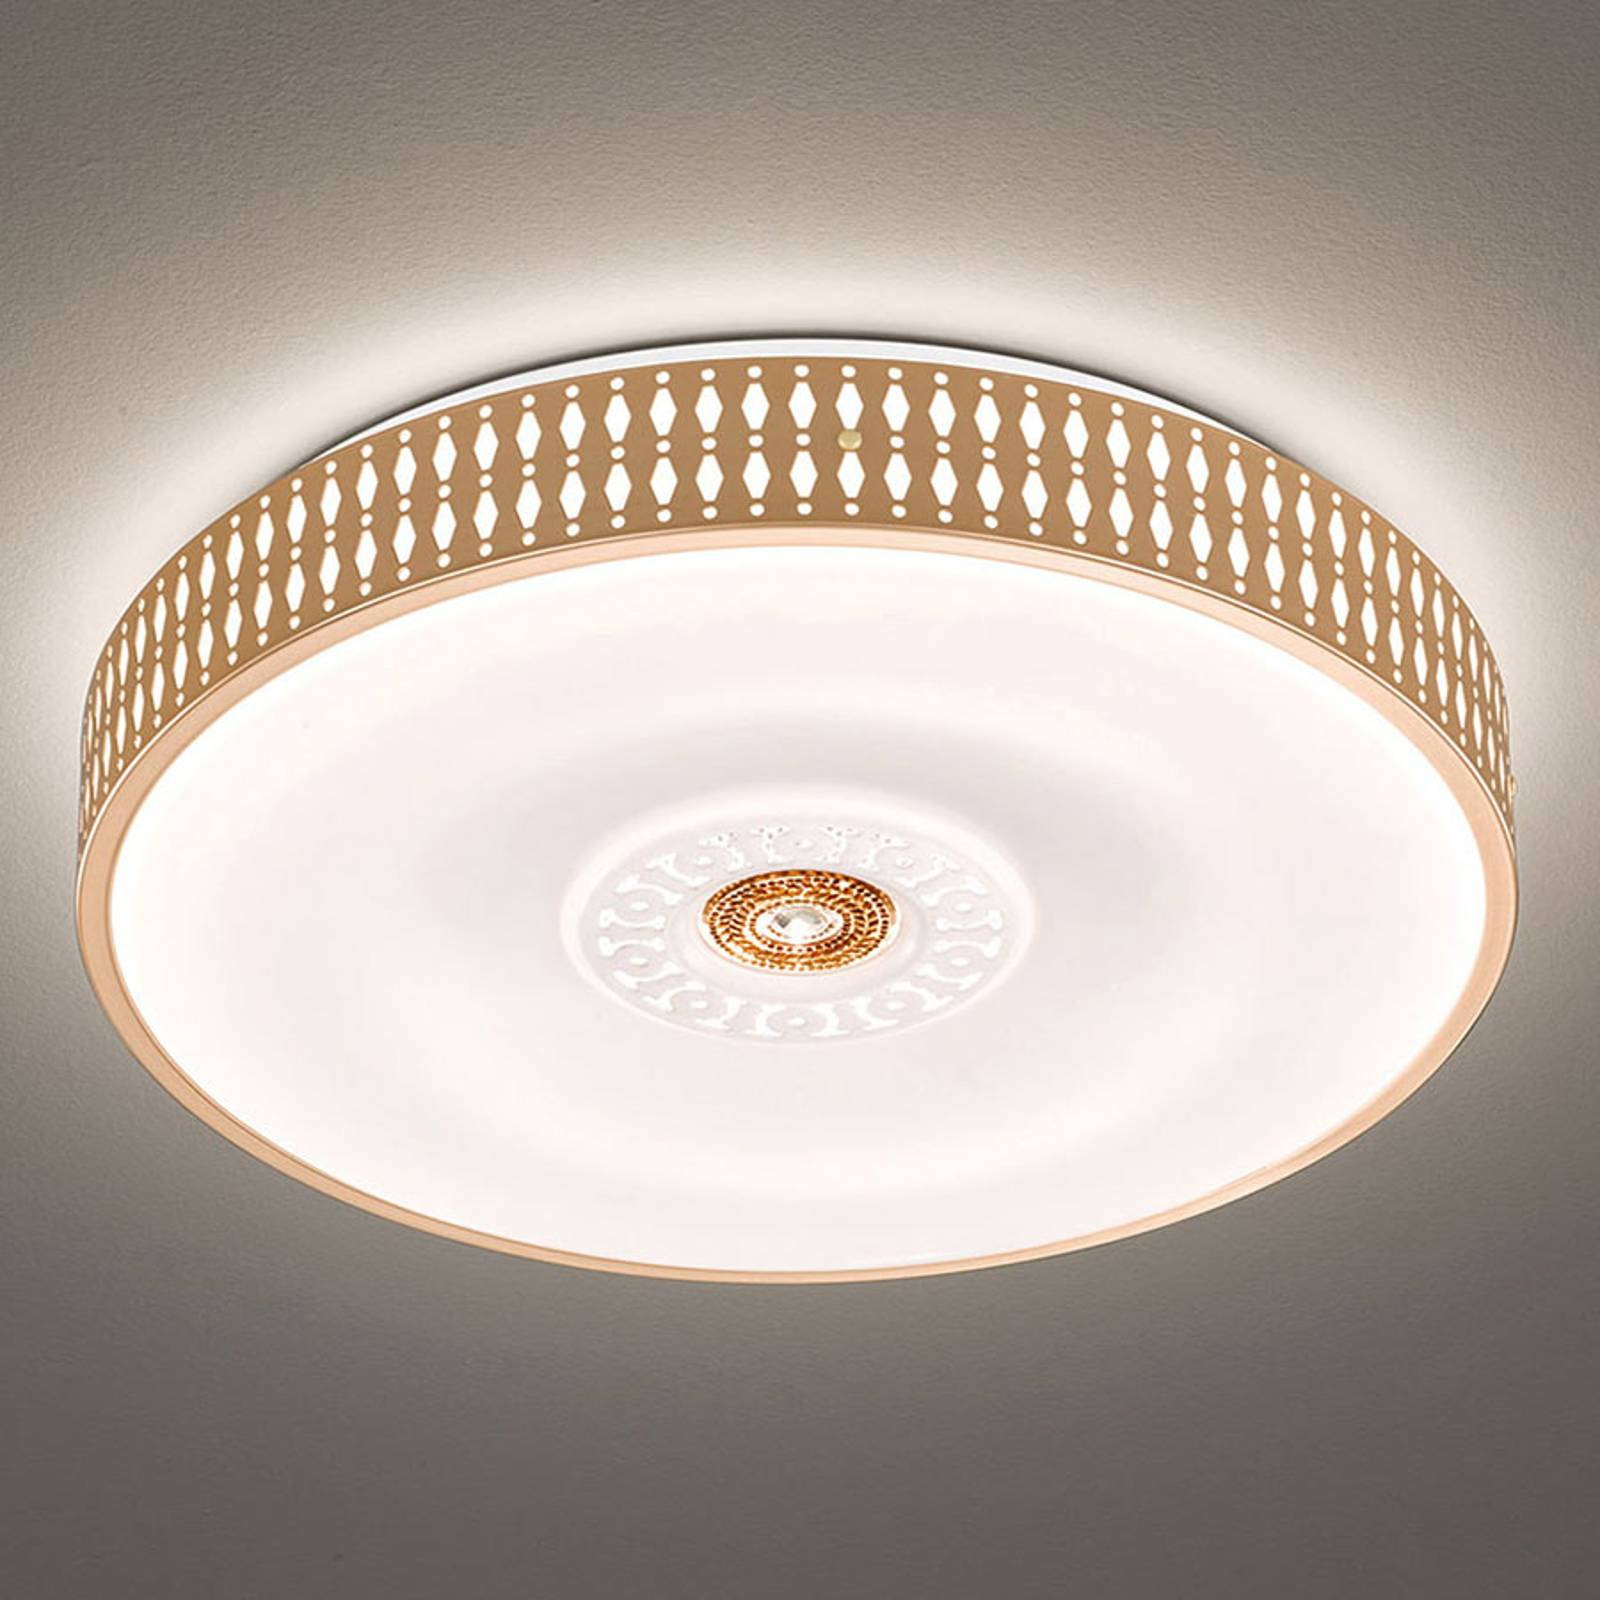 LED-Deckenleuchte Coso, dimmbar, Ø 50 cm